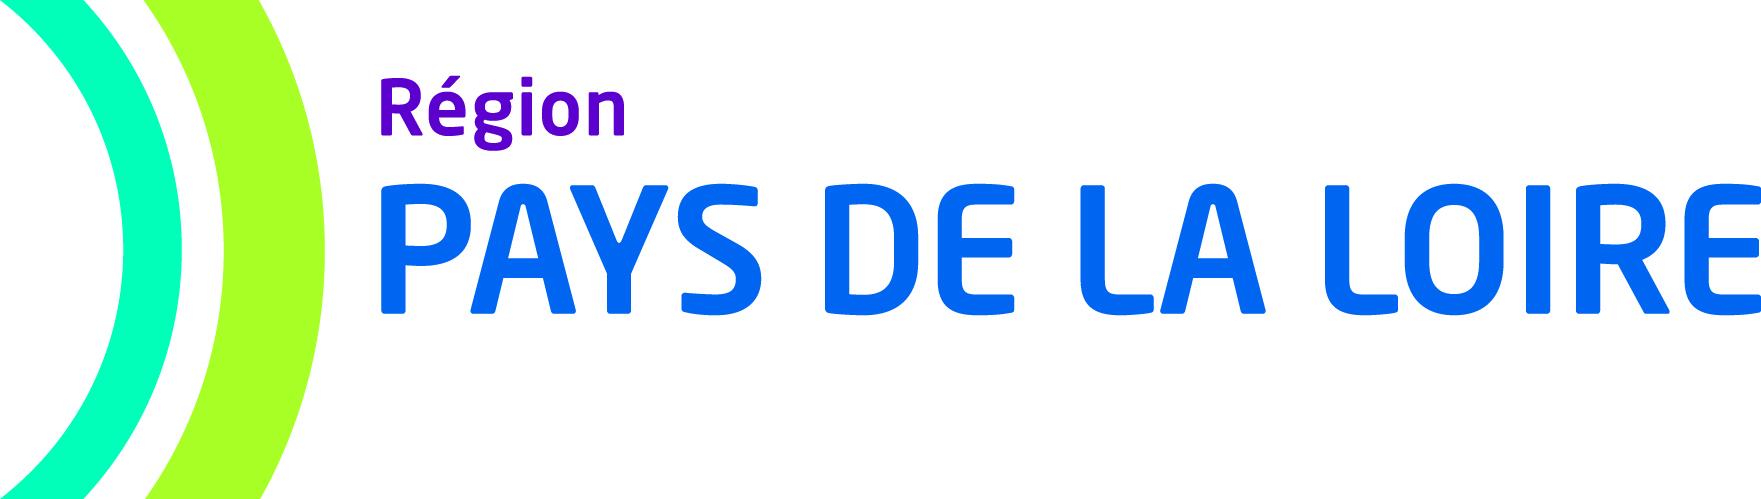 REGION PAYS DE LOIRE